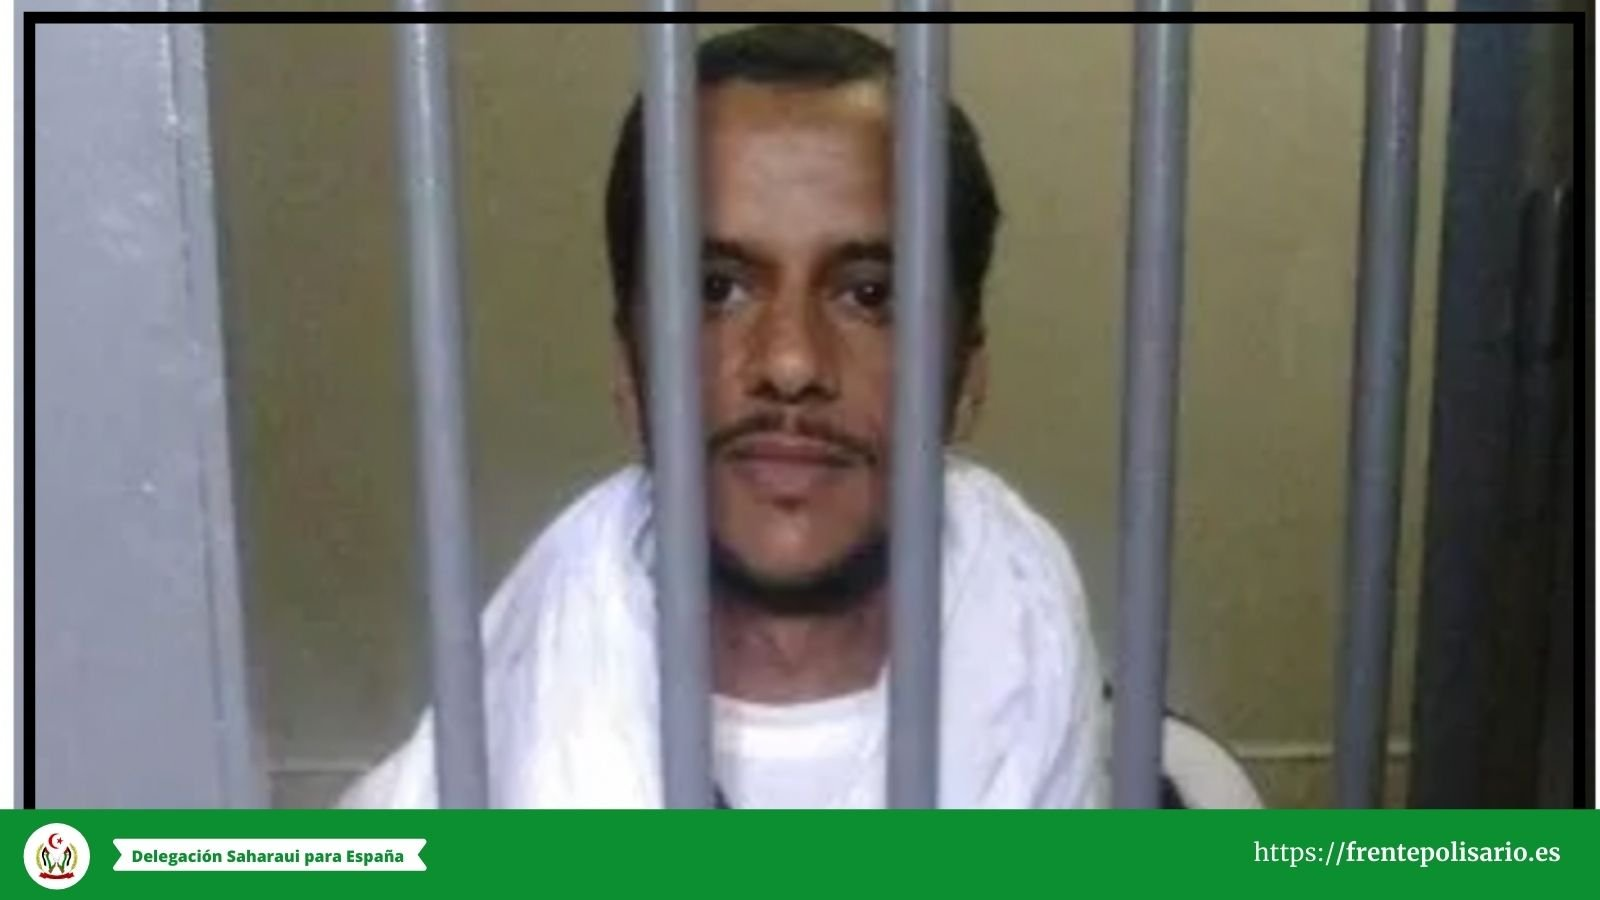 Mohamed lamine Haddi